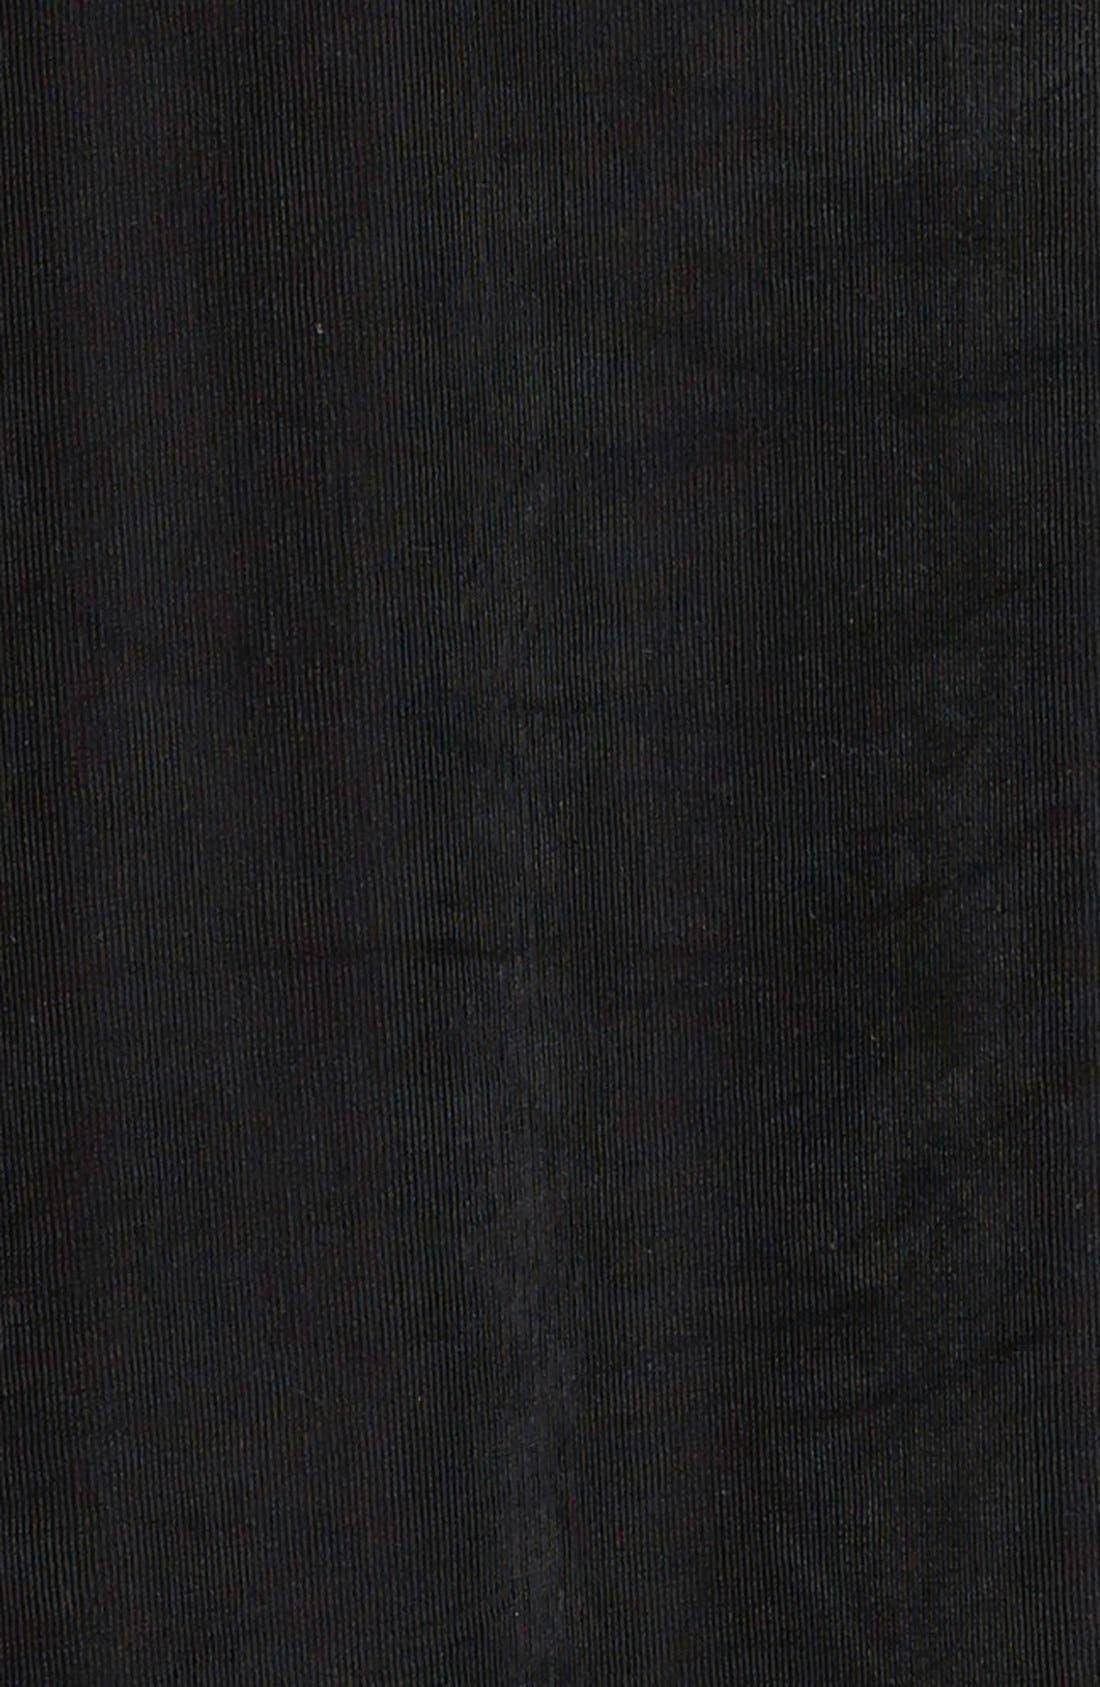 Alternate Image 3  - Vikki Vi Long A-Line Skirt (Plus Size)